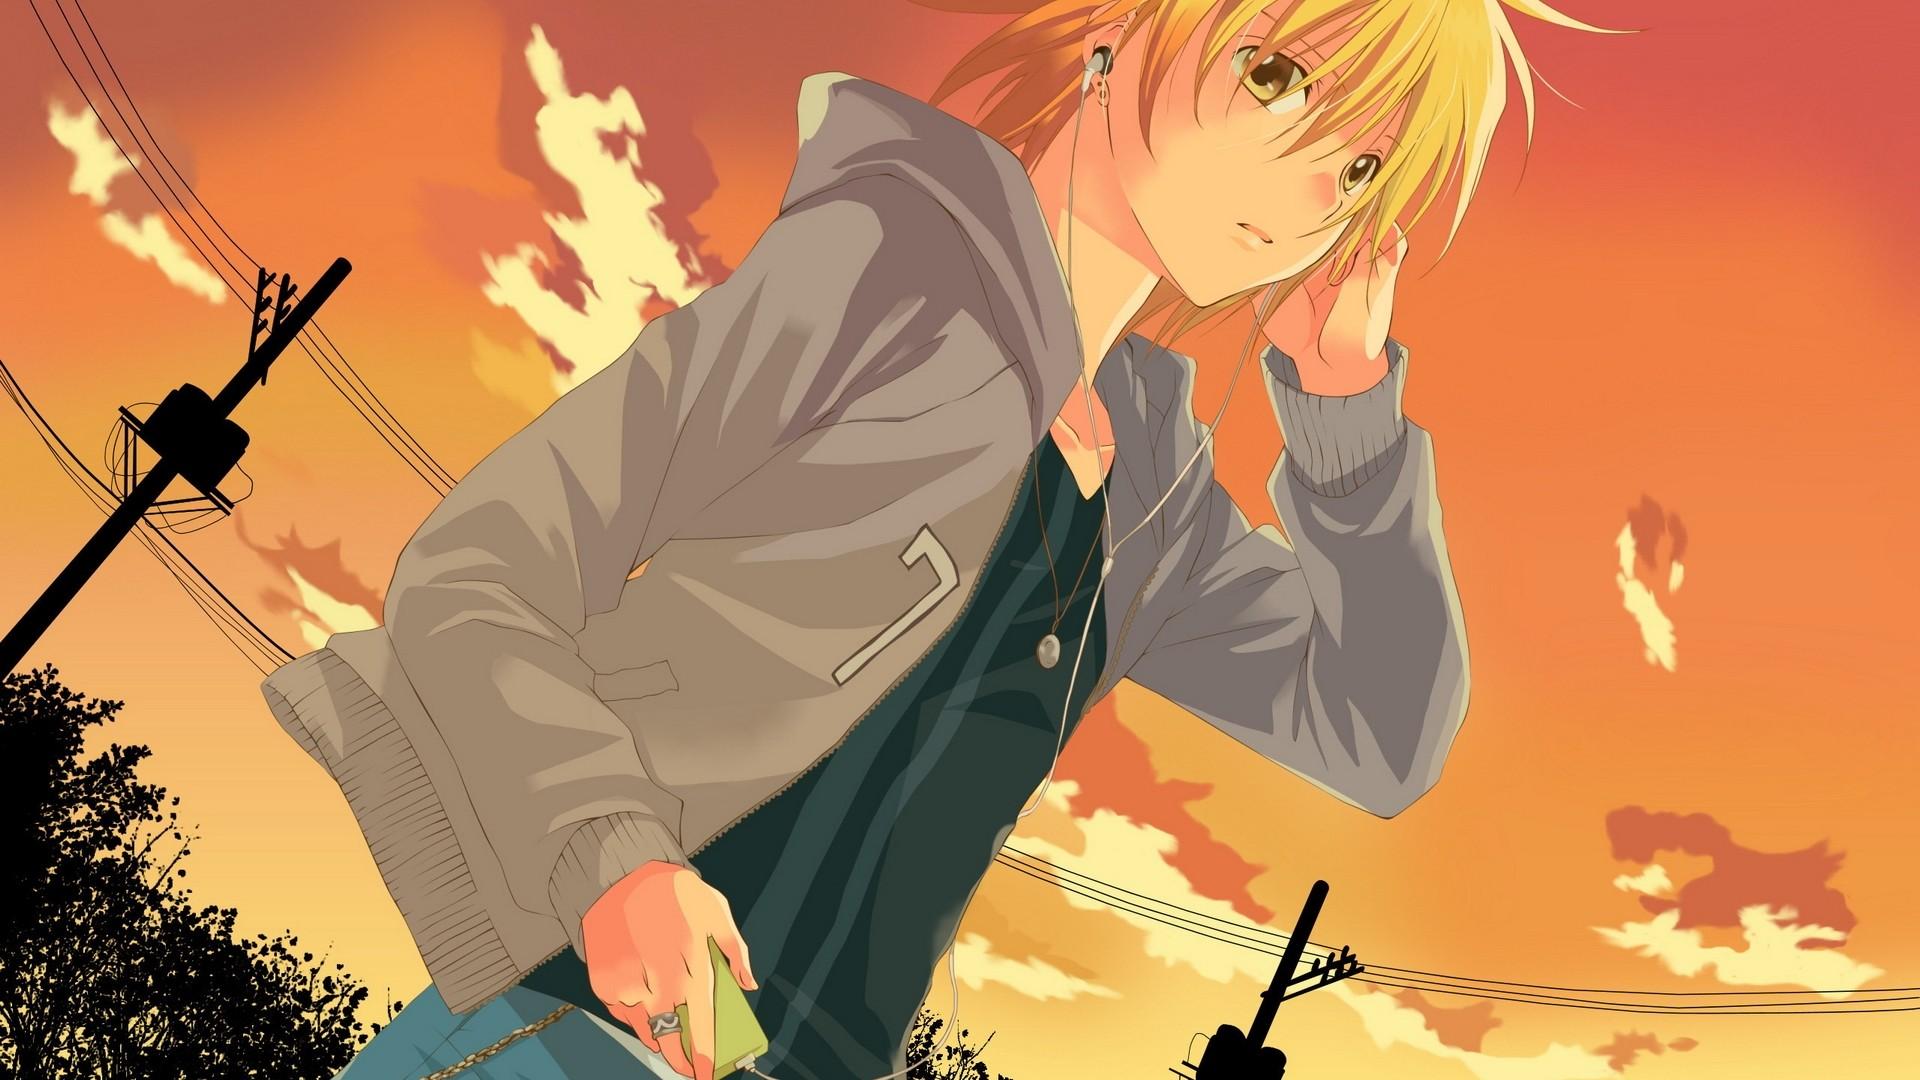 Handsome Anime Boy PC Wallpaper